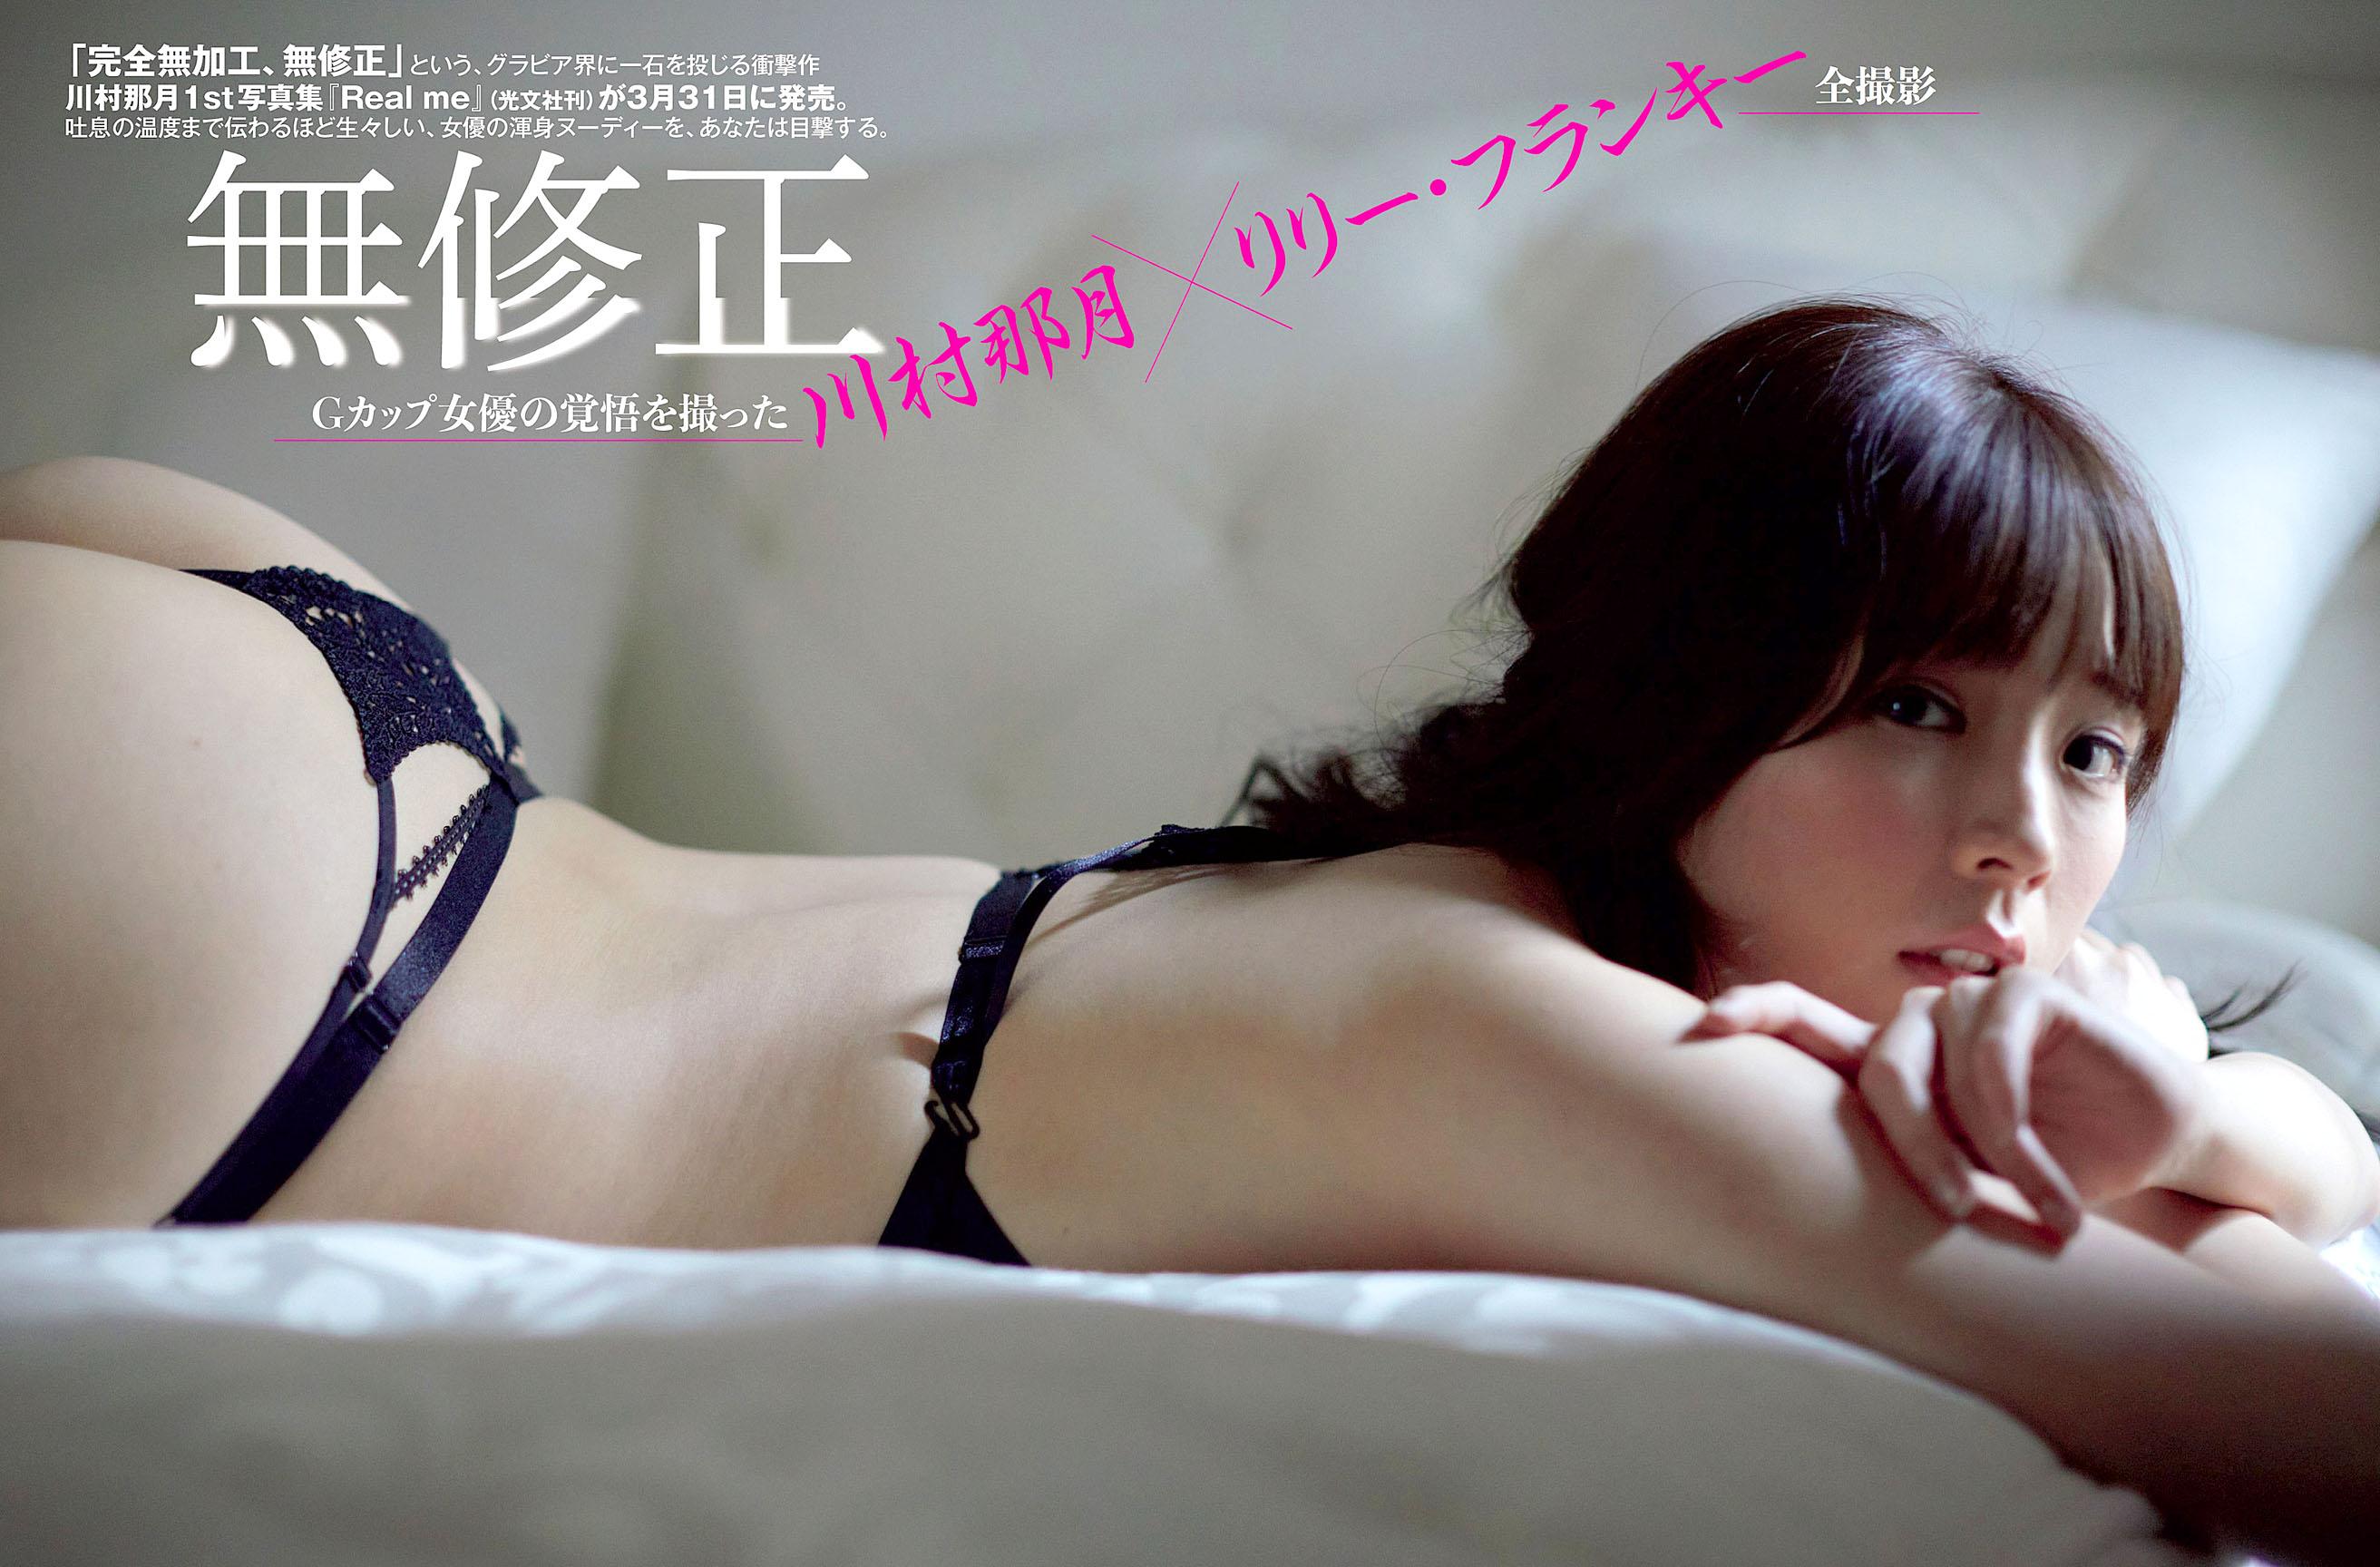 Natsuki Kawamura Flash 210302 02.jpg